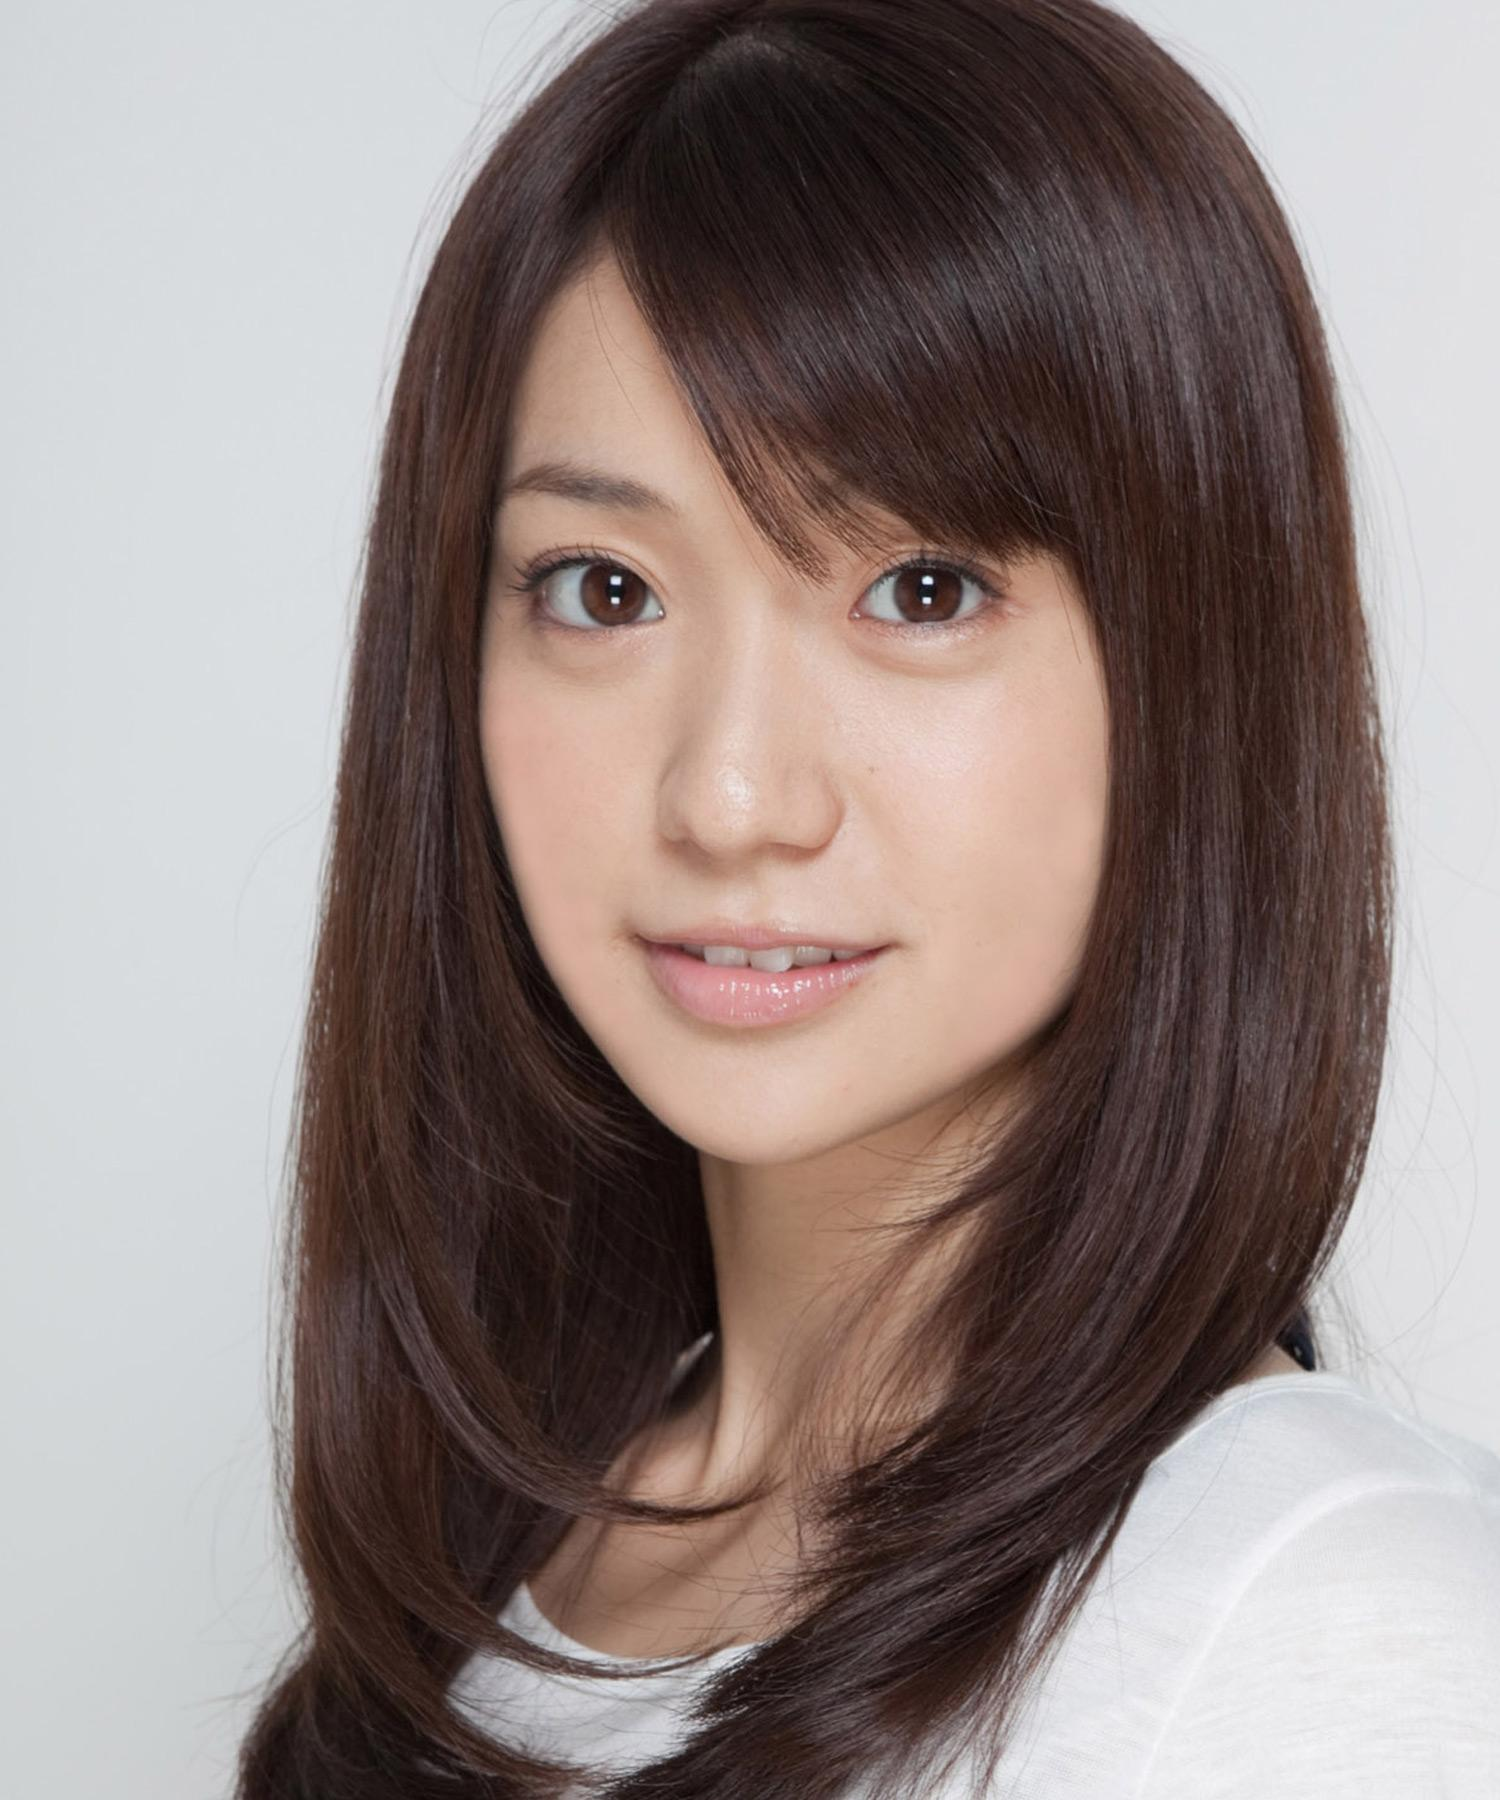 Yuko Oshima : エラ 髪型 ロング : 髪型 ロング